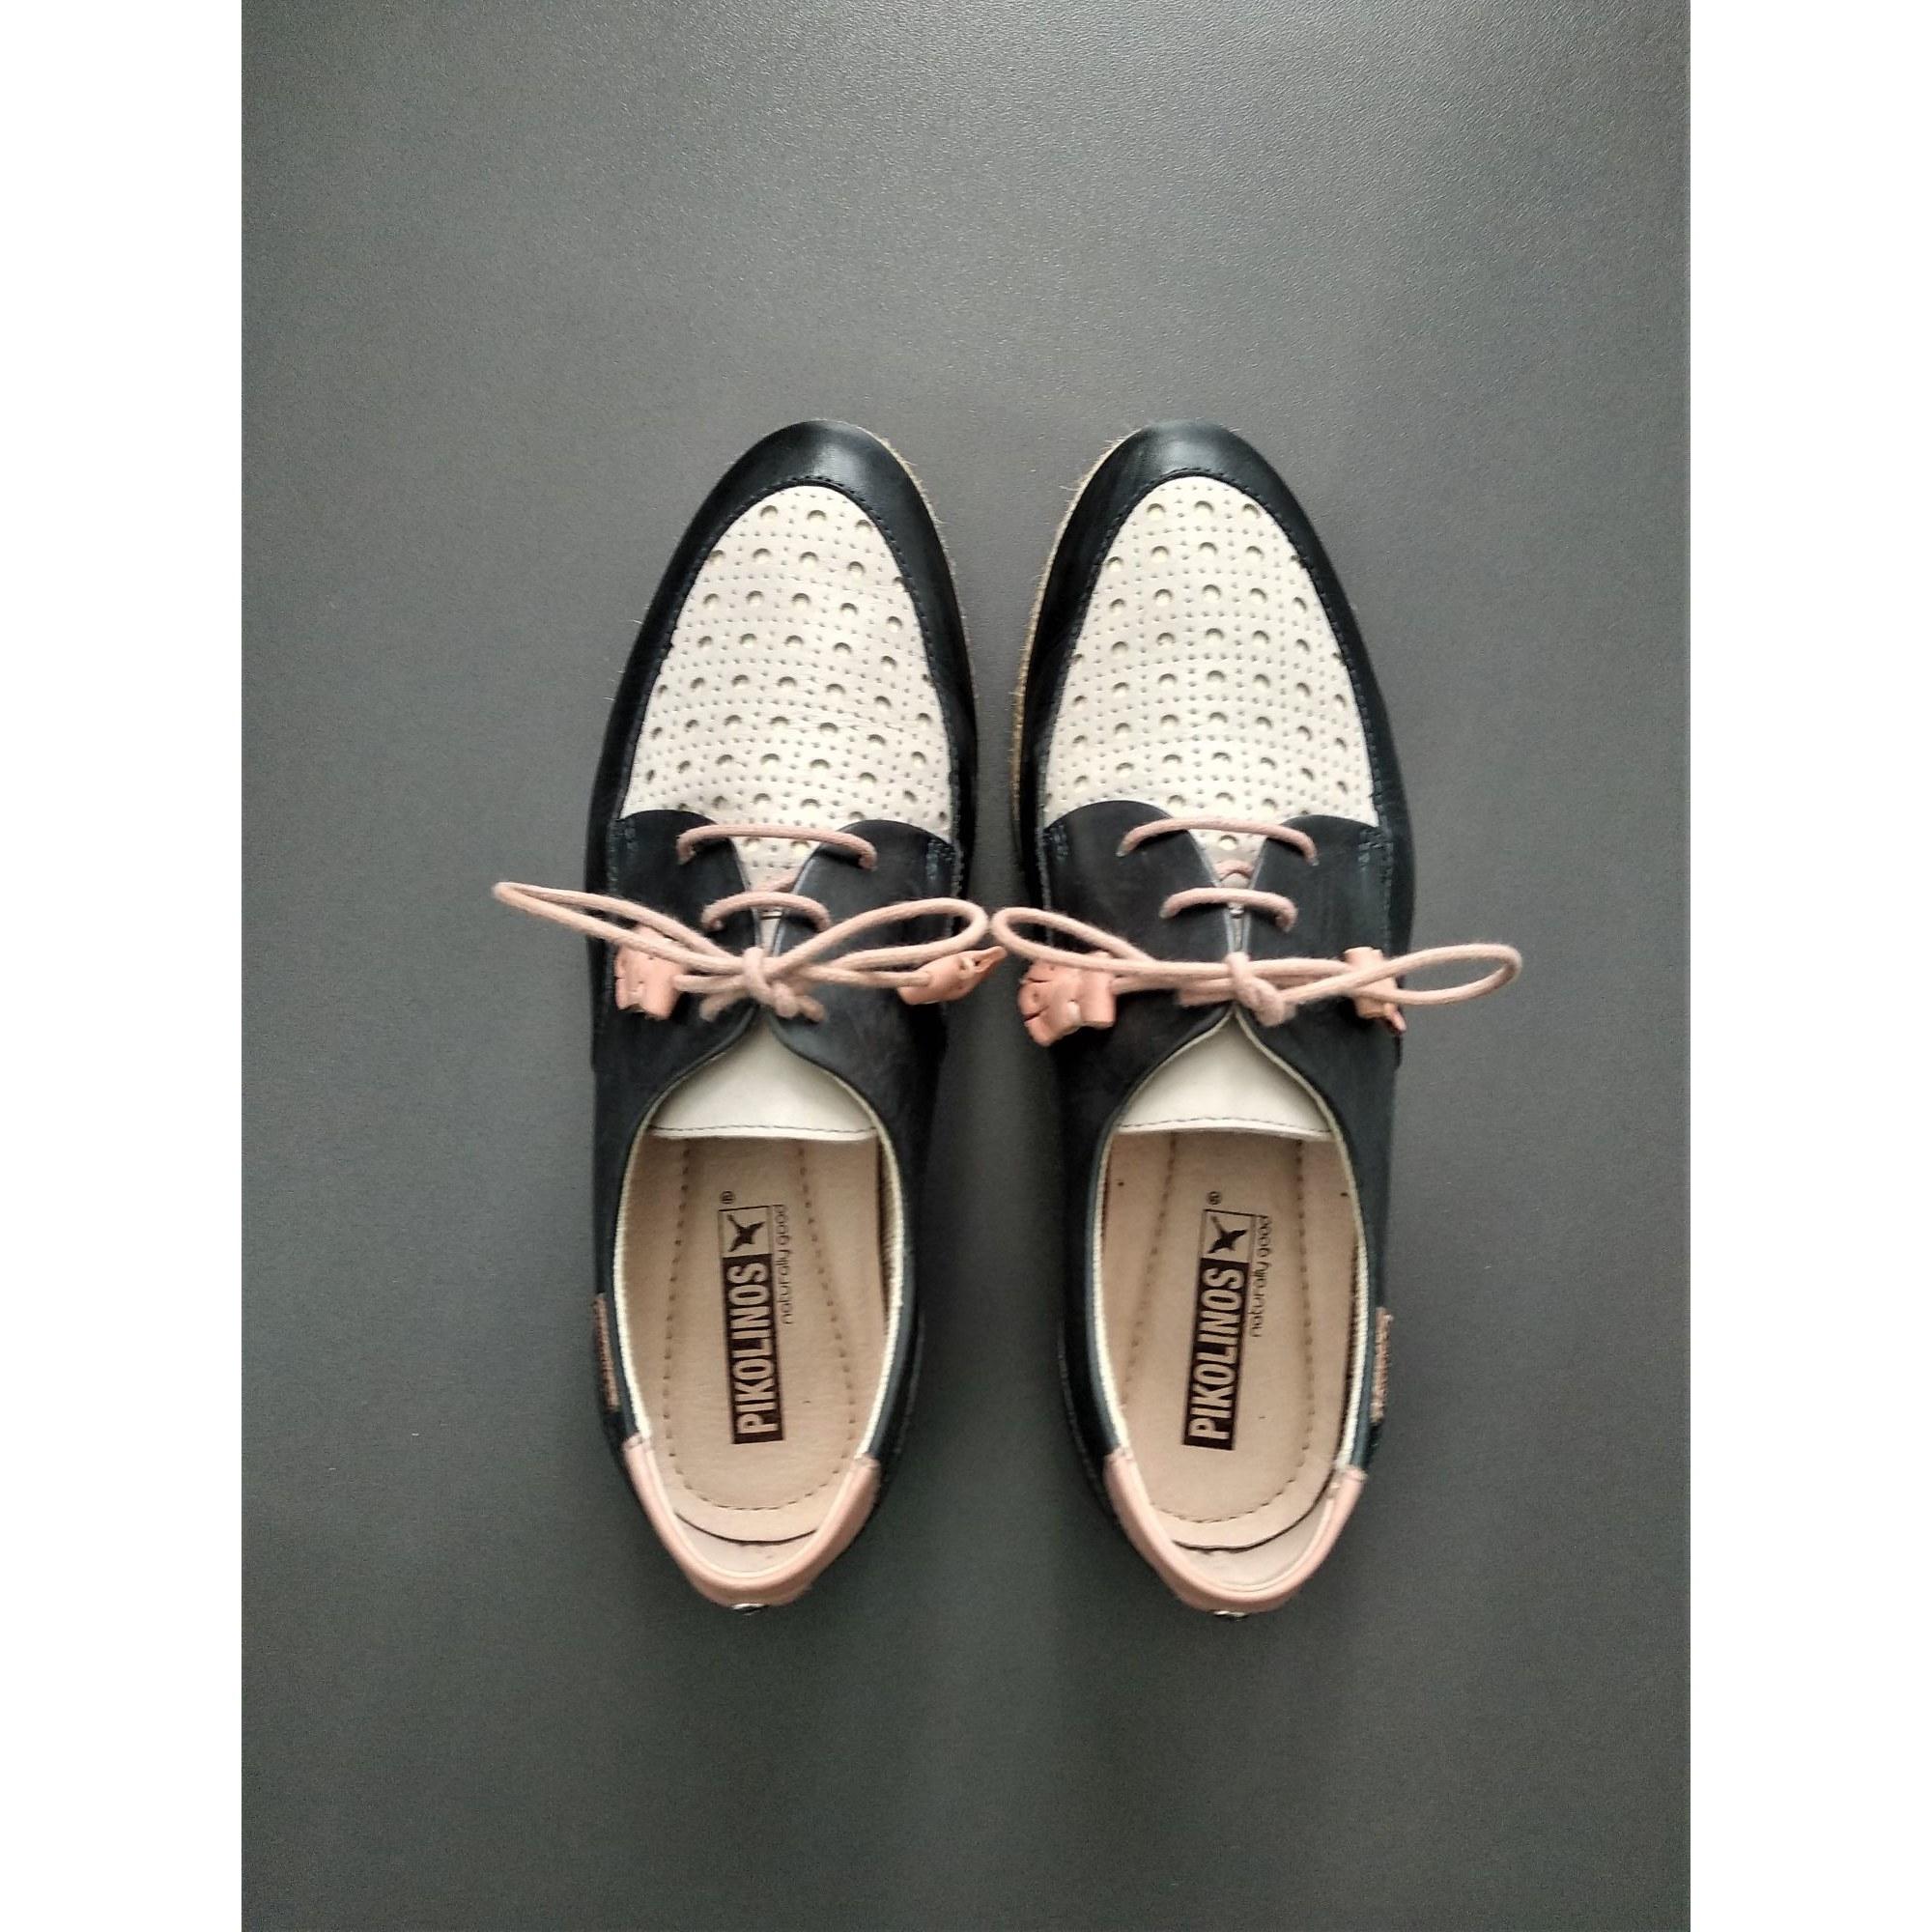 Chaussures à lacets  PIKOLINOS Bleu, bleu marine, bleu turquoise